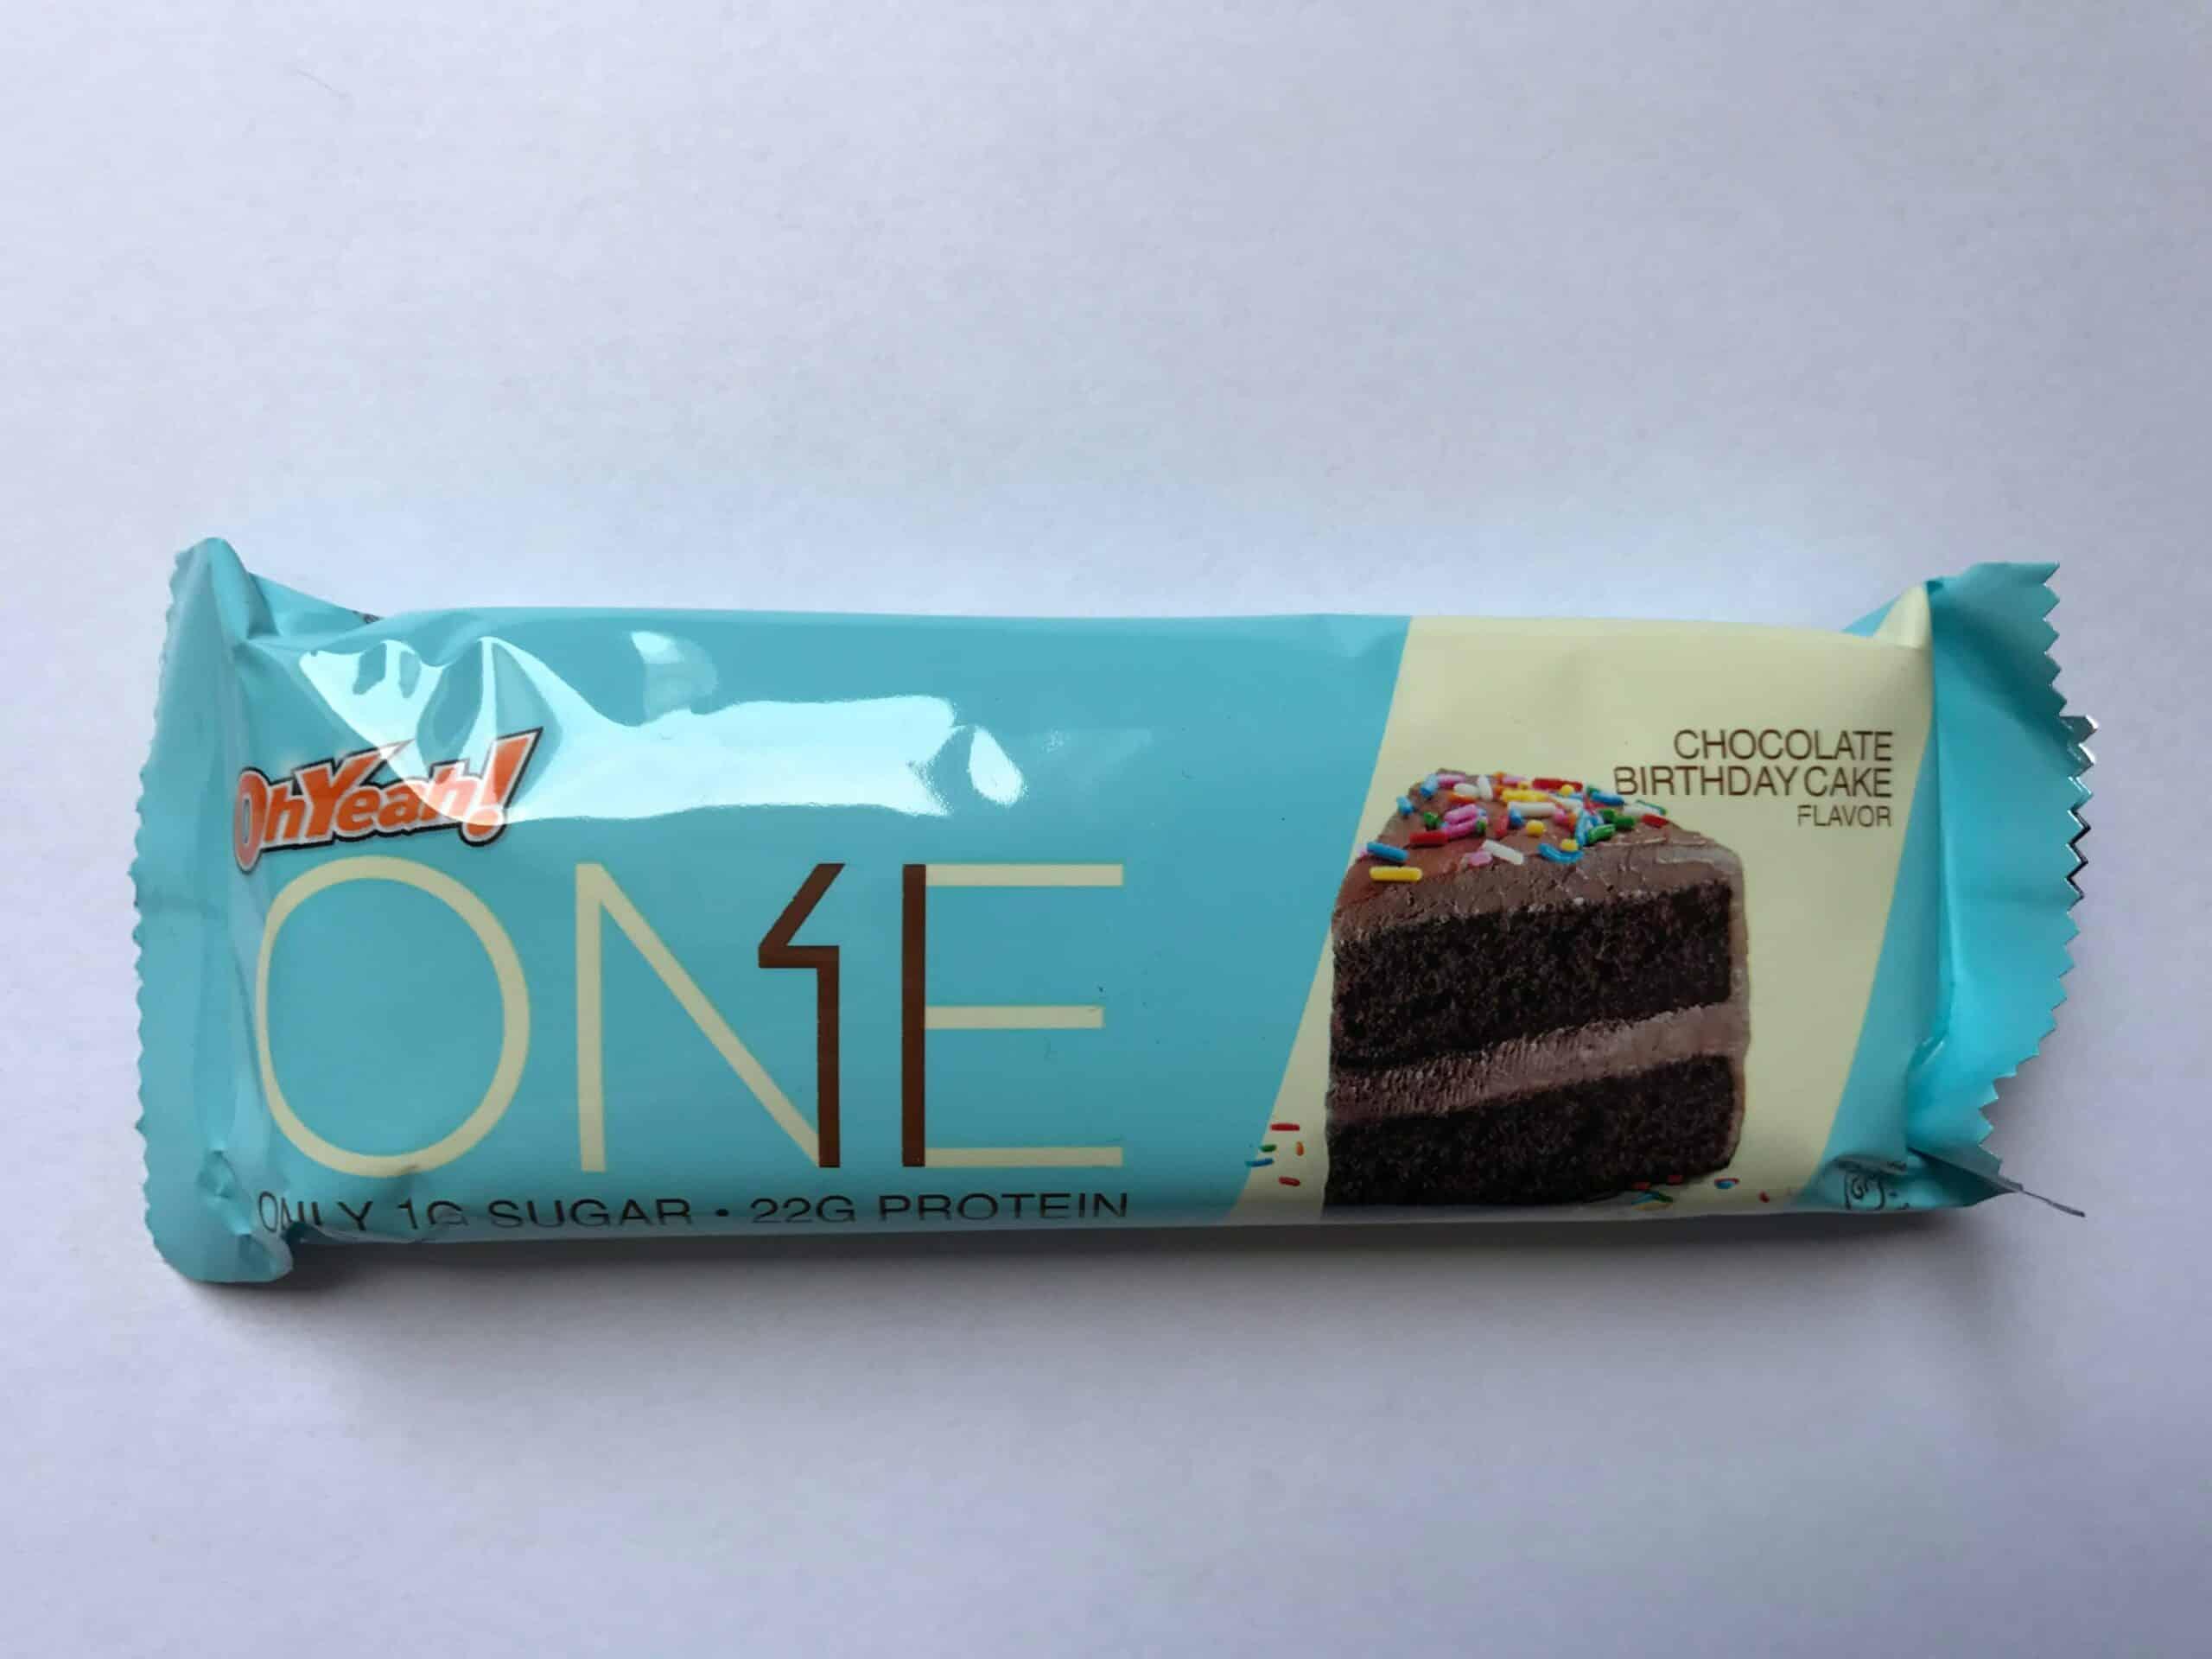 Iss Oh Yeah One Bar Protein Riegel Chocolate Birthday Cake 60g Proteinriegel Test